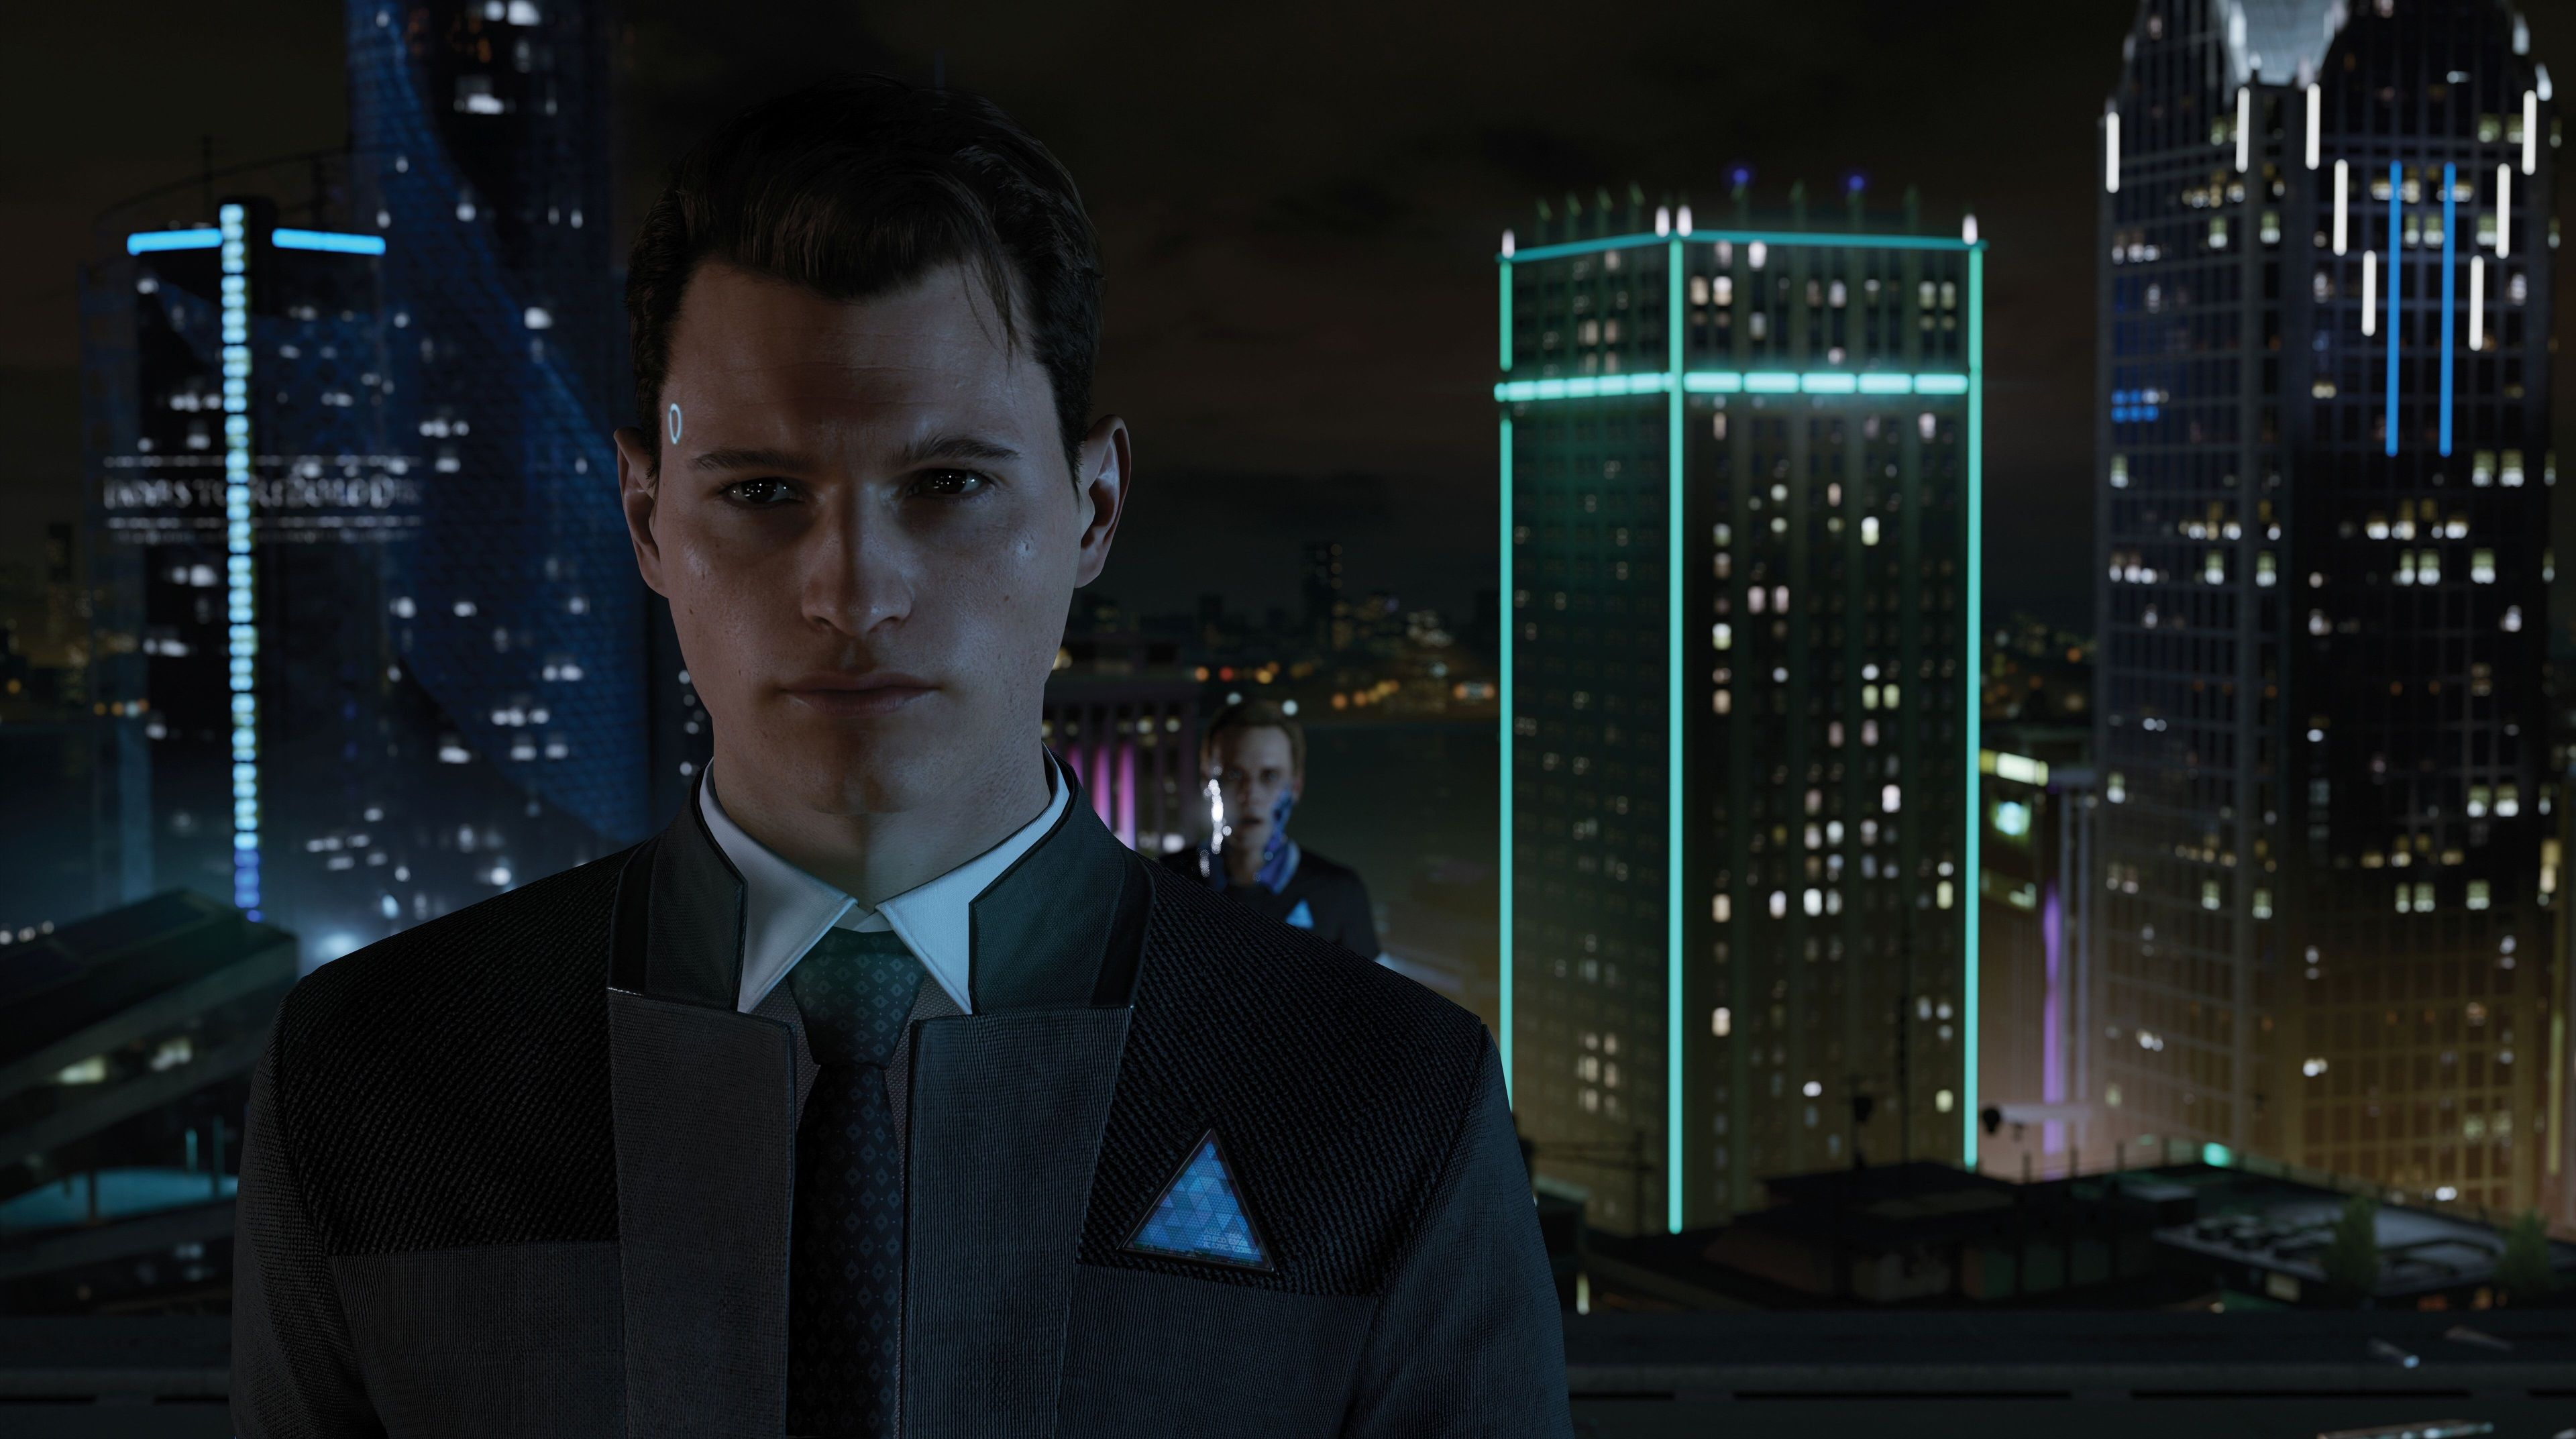 3840x2145 Detroit Become Human 4k Computer Wallpaper Detroit Become Human Detroit Become Human Actors Detroit Become Human Connor